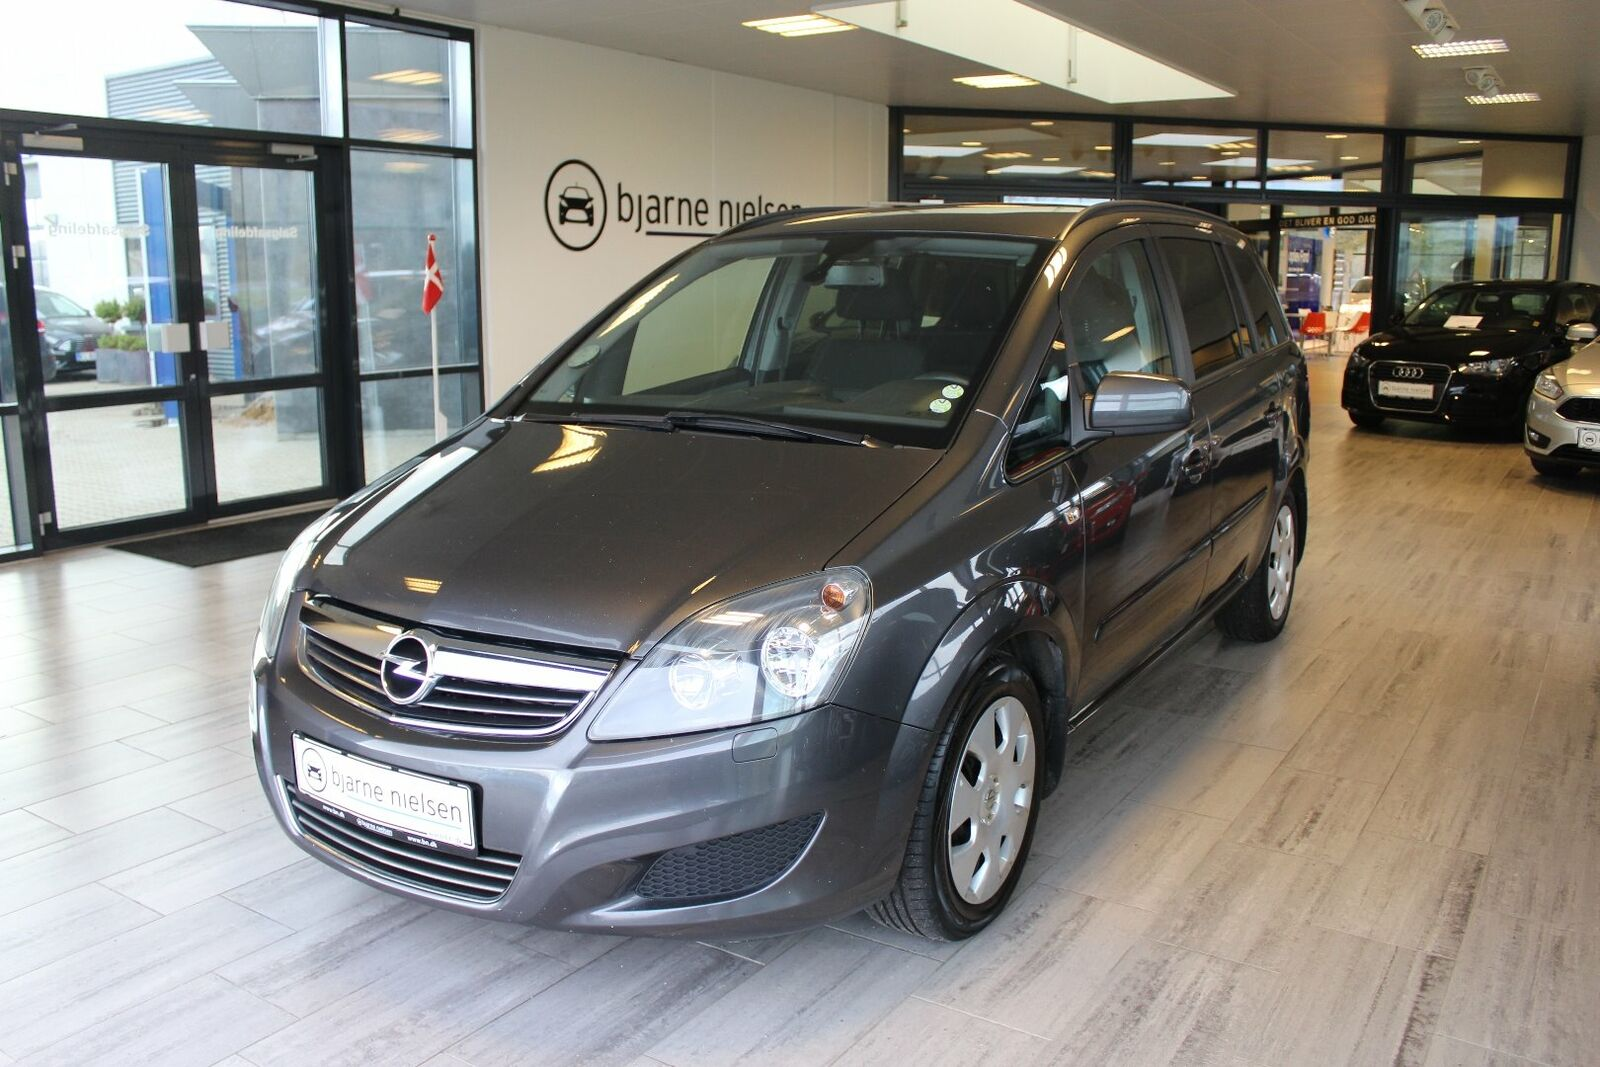 Opel Zafira Billede 2